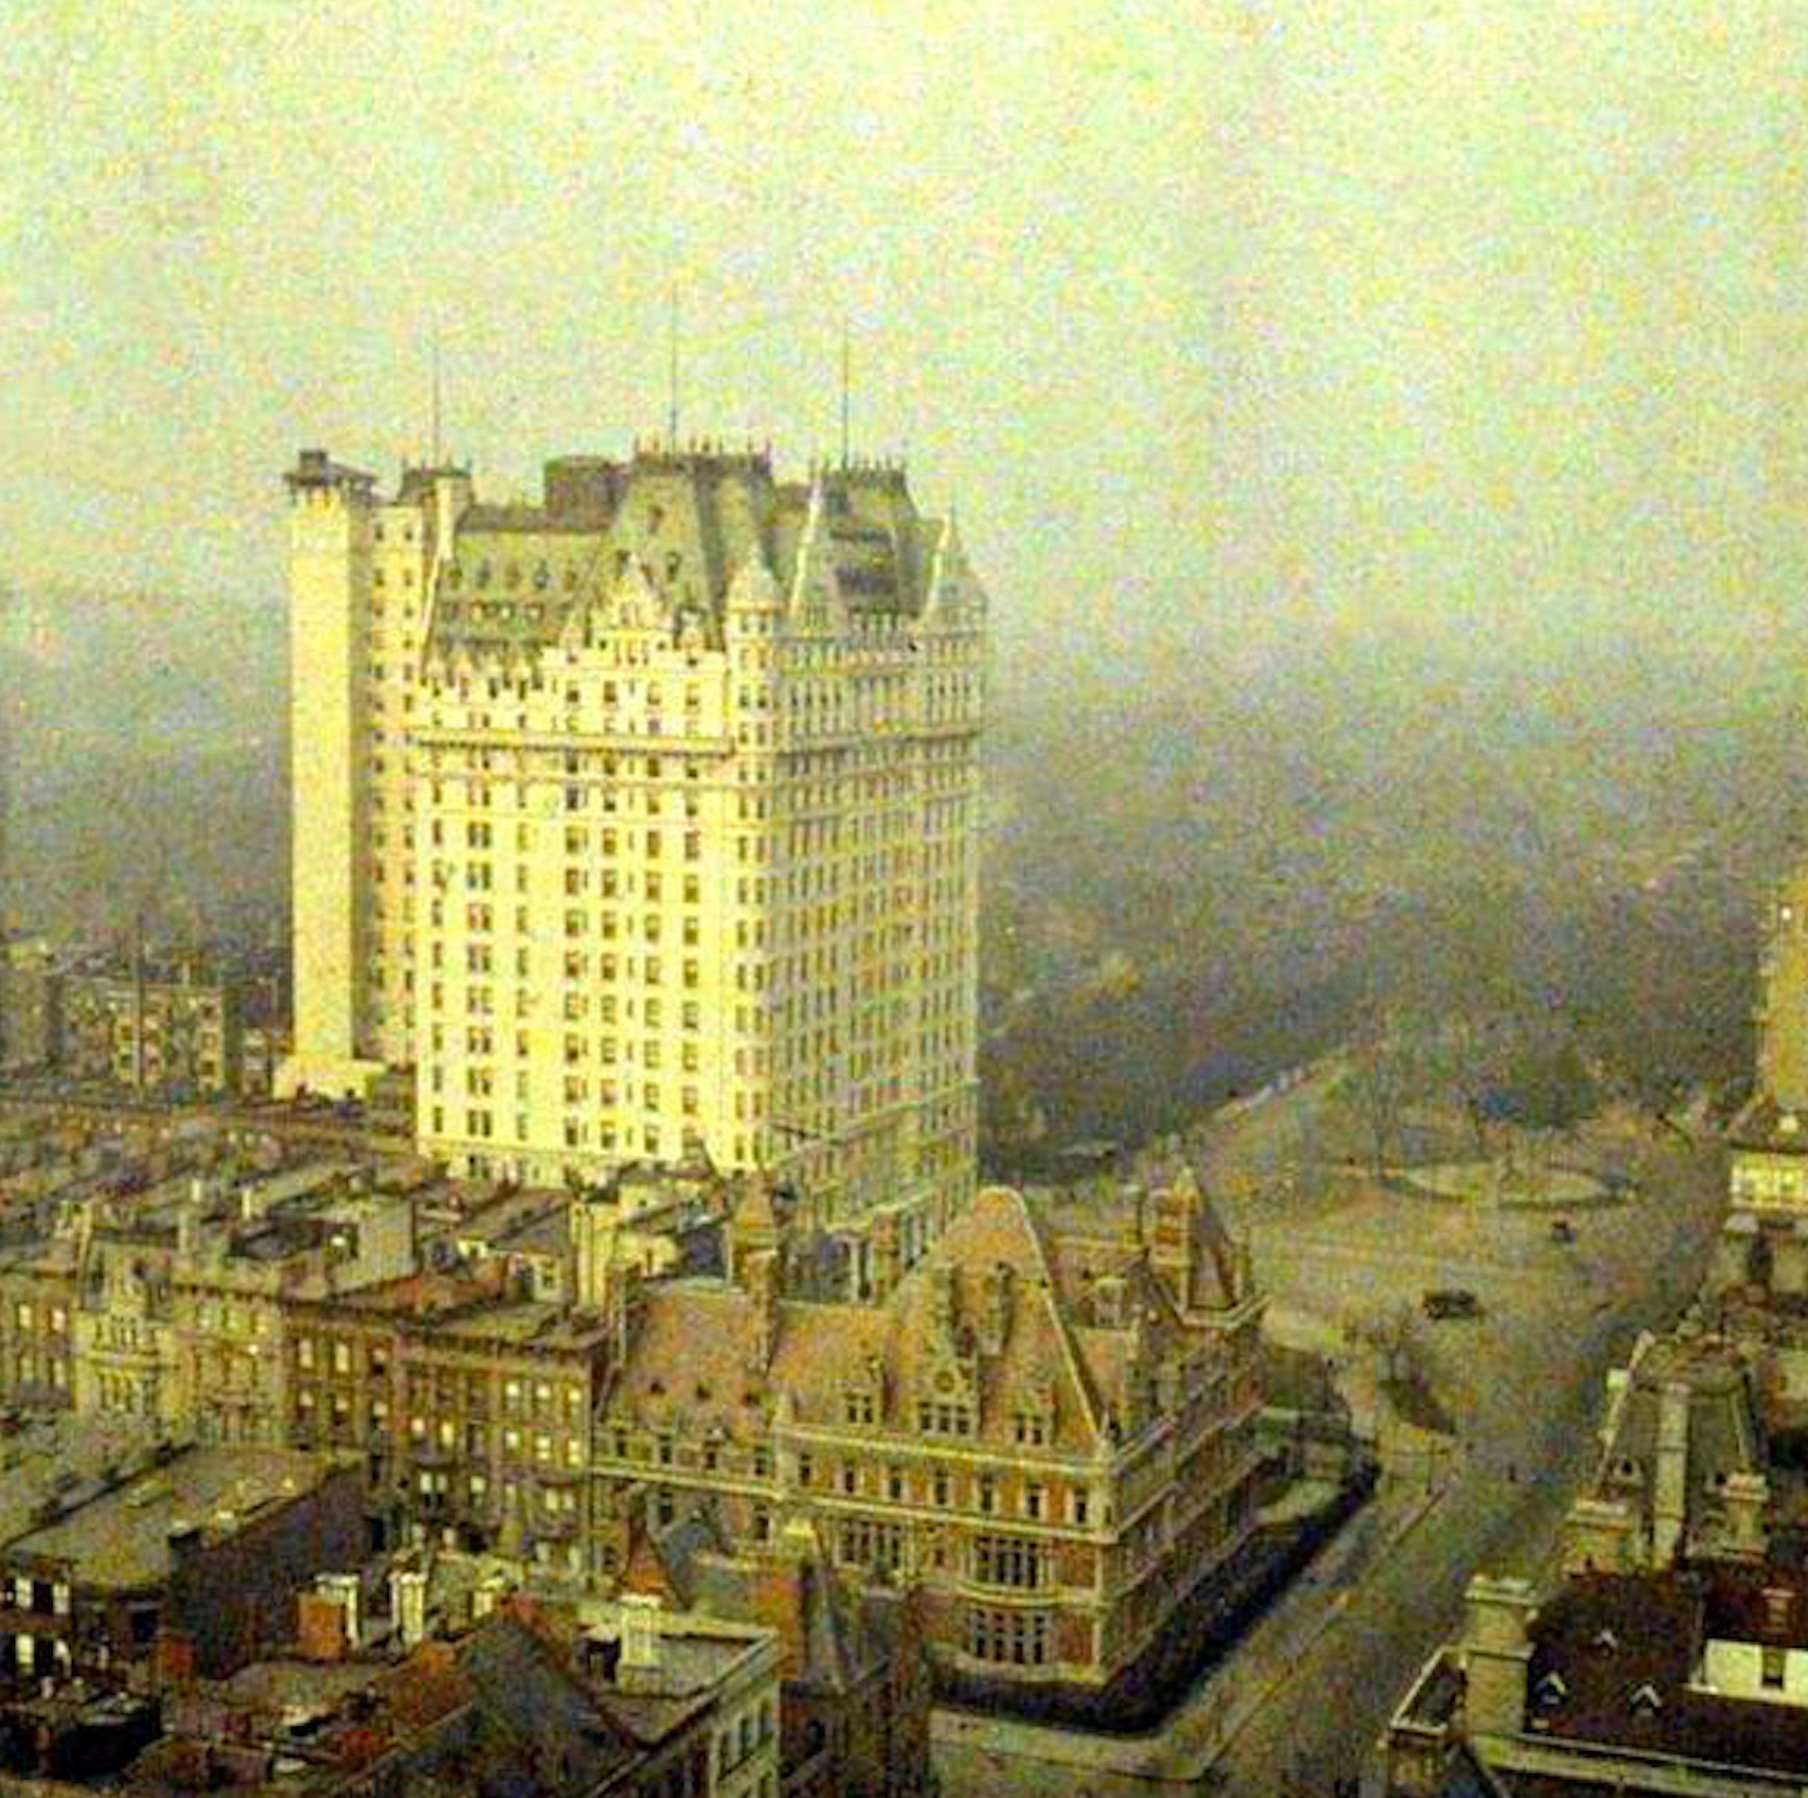 18 And Older Hotels In New York: Vintage Colorized Photograph Shows Plaza Hotel, Vanderbilt